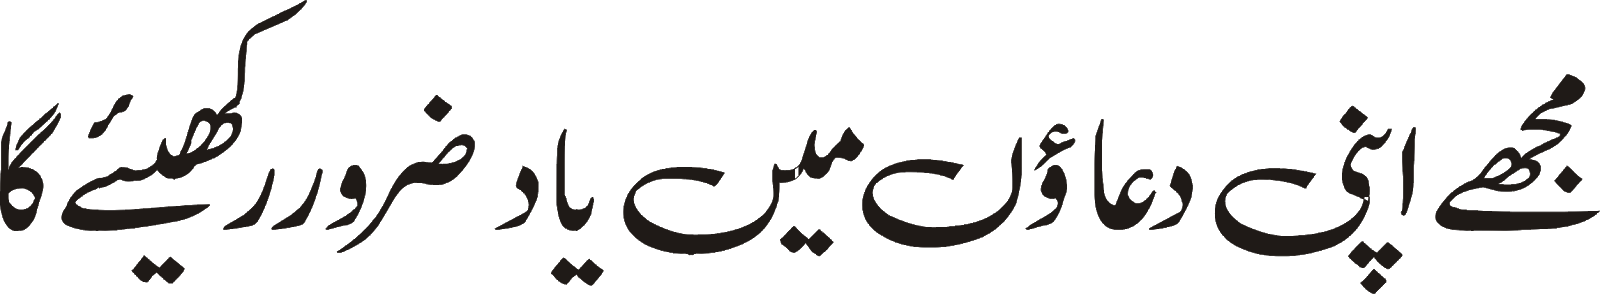 Download Urdu Ttf Fonts Urdu Fonts South Asian Language and Resource